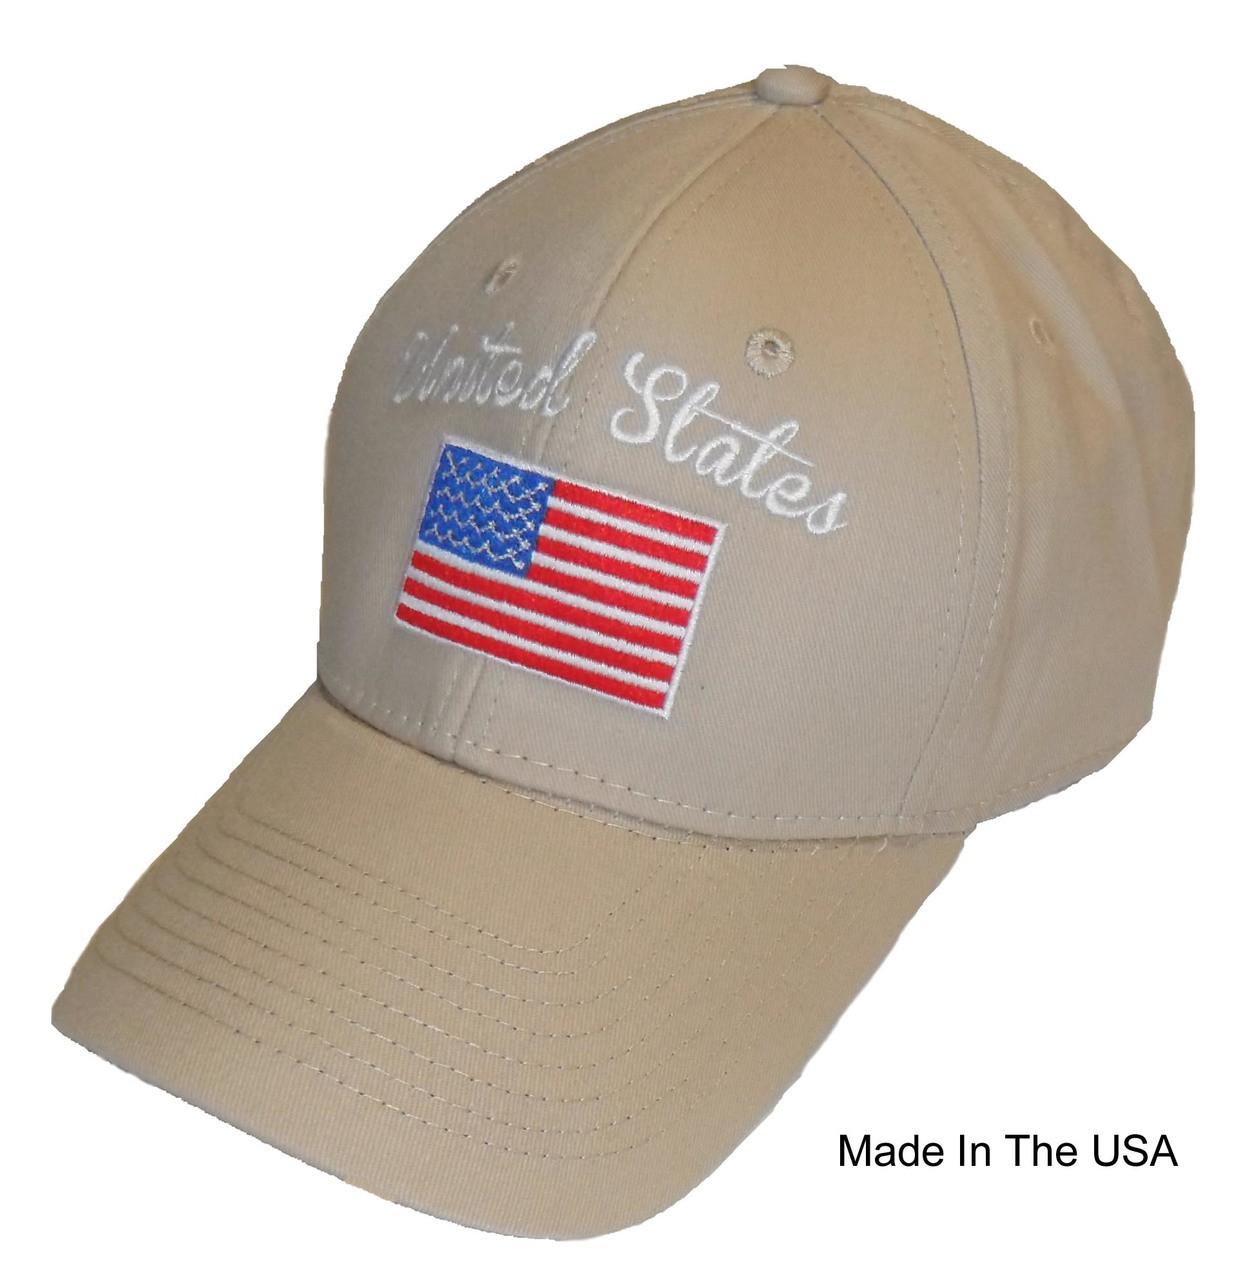 e905e7dc7c3 Made In The USA Khaki United States RWB American Flag Embroidered Baseball  Cap Hat